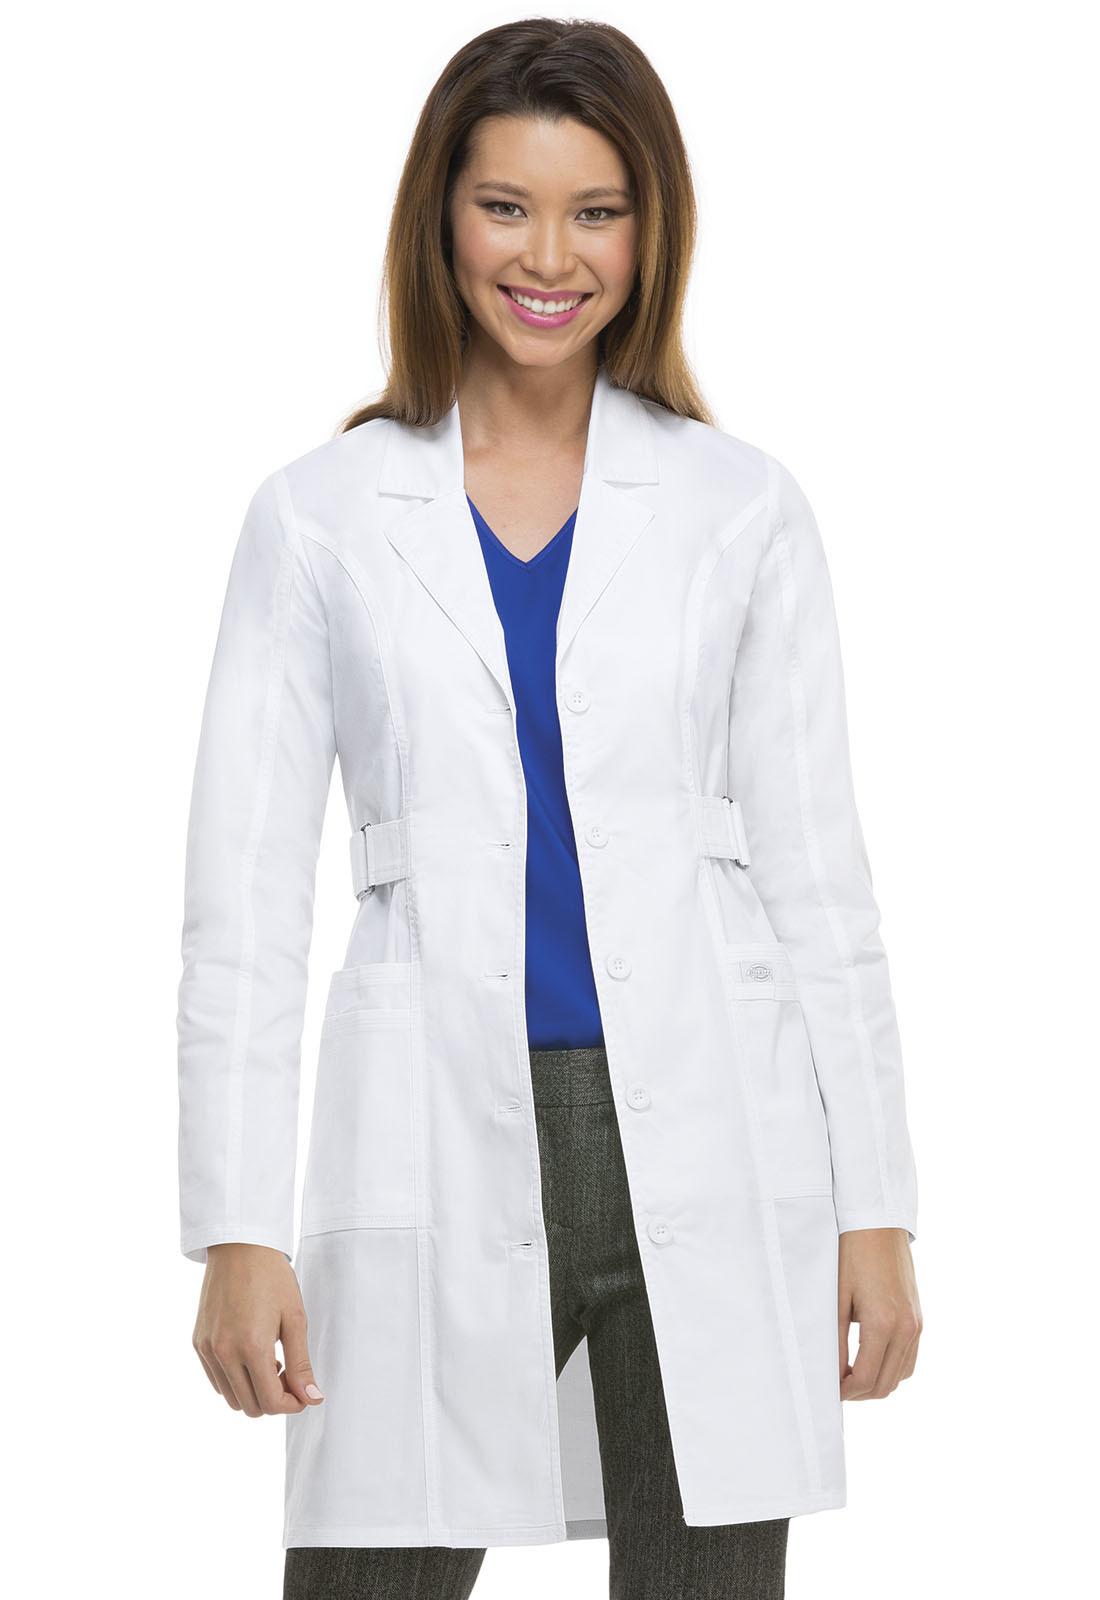 Медицинский халат женский Dickies